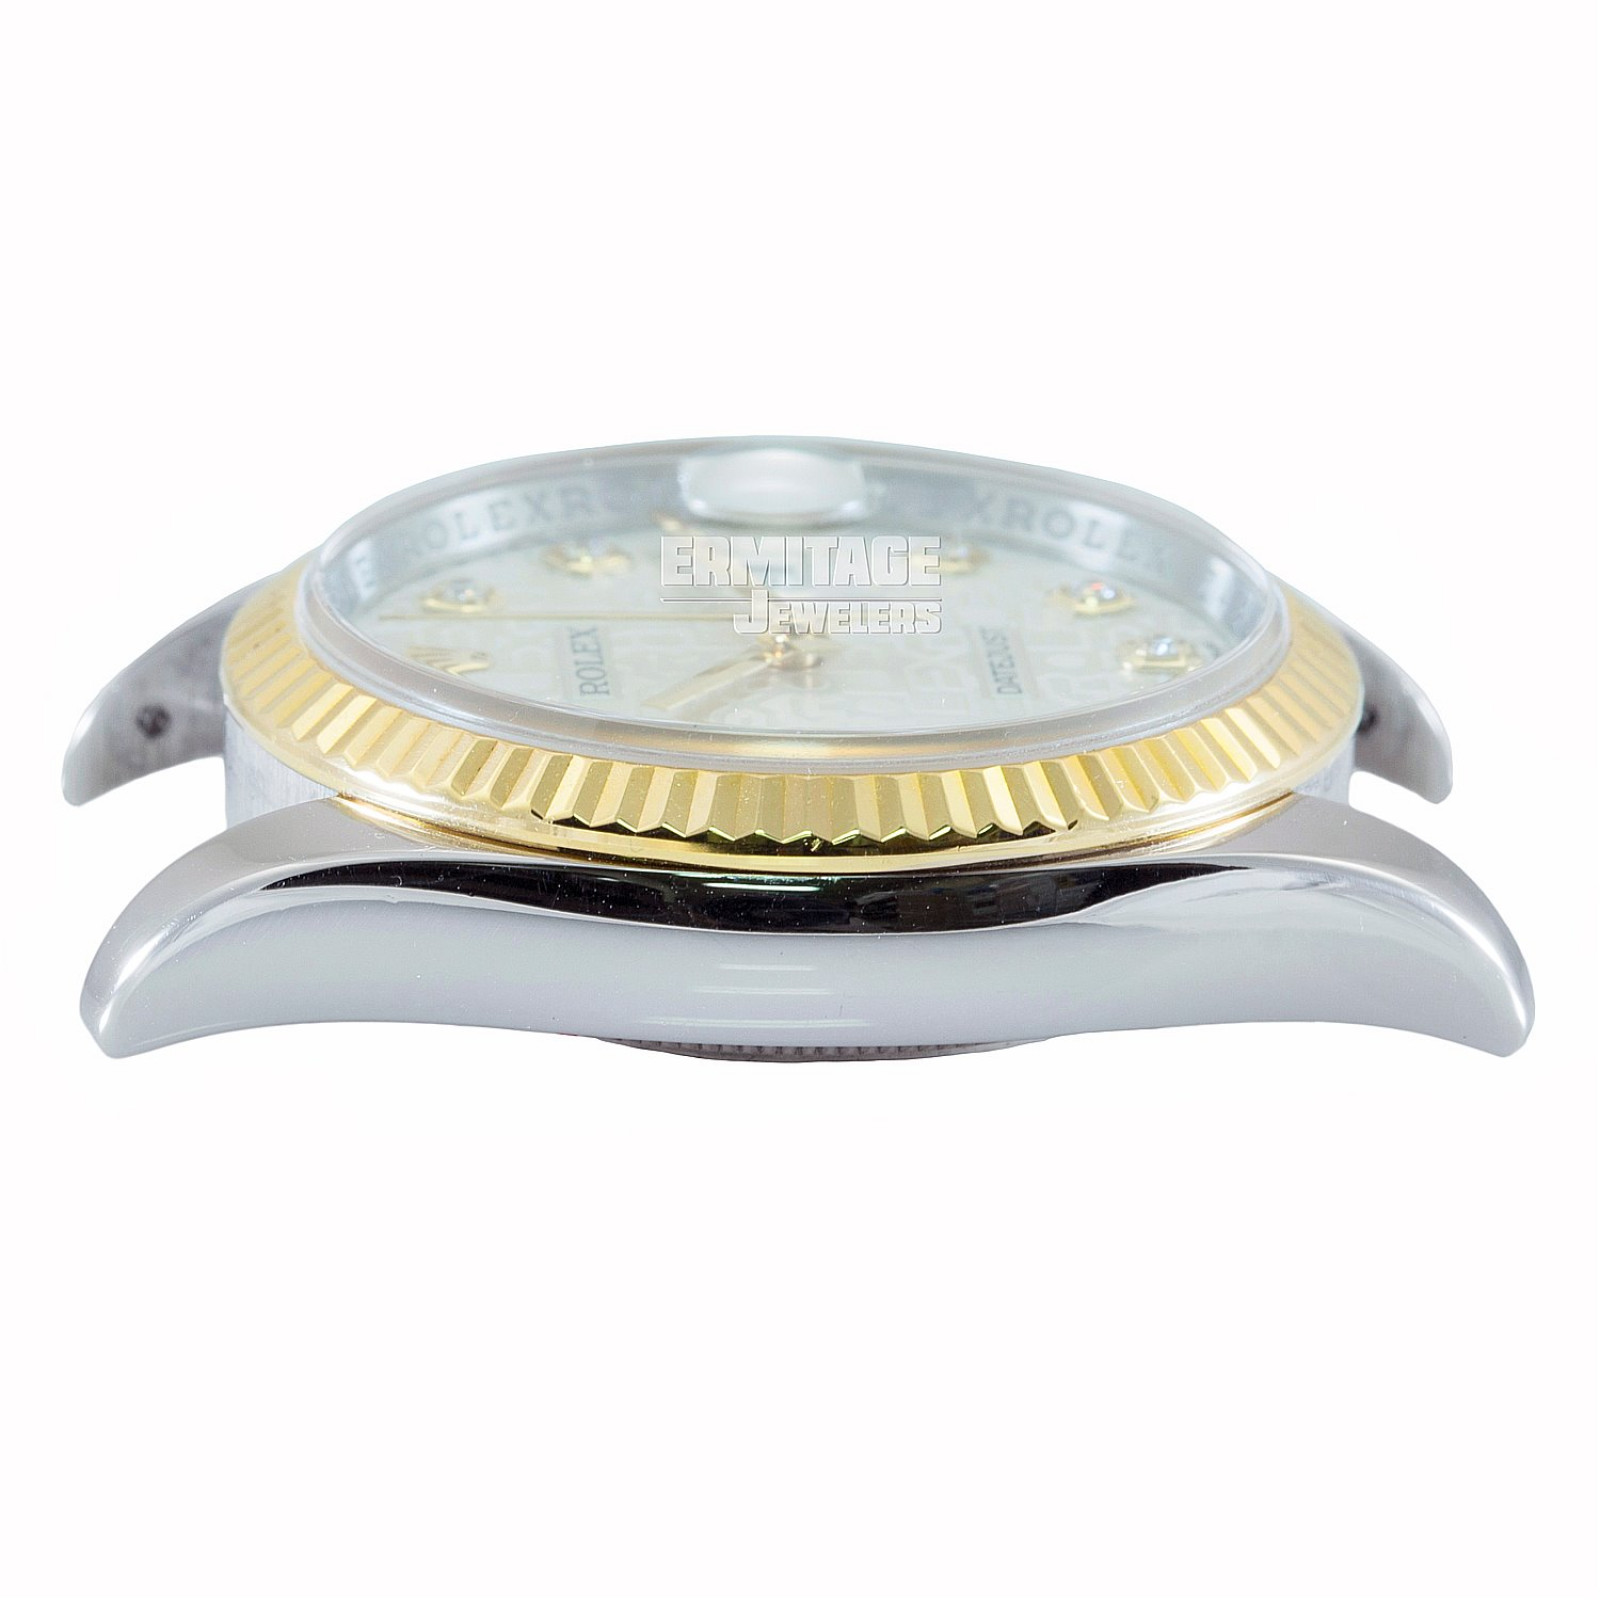 2009 Dimaond Rolex Datejust Ref. 116233